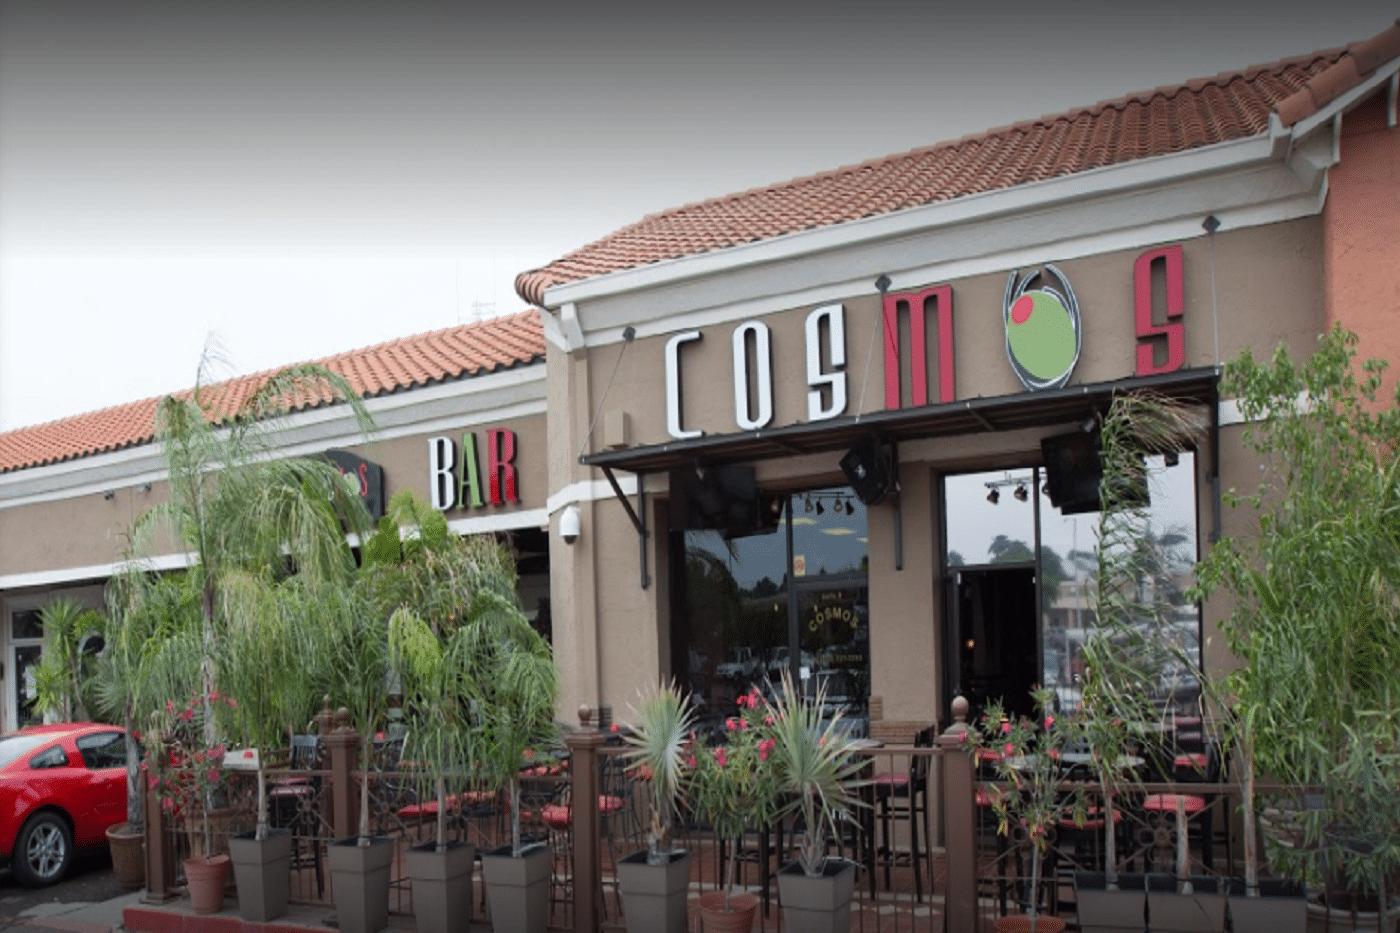 Cosmos Bar & Grill,201 W Del Mar Blvd Ste 8, Laredo, TX 78041 was cited for a Refilling Liquor Violation